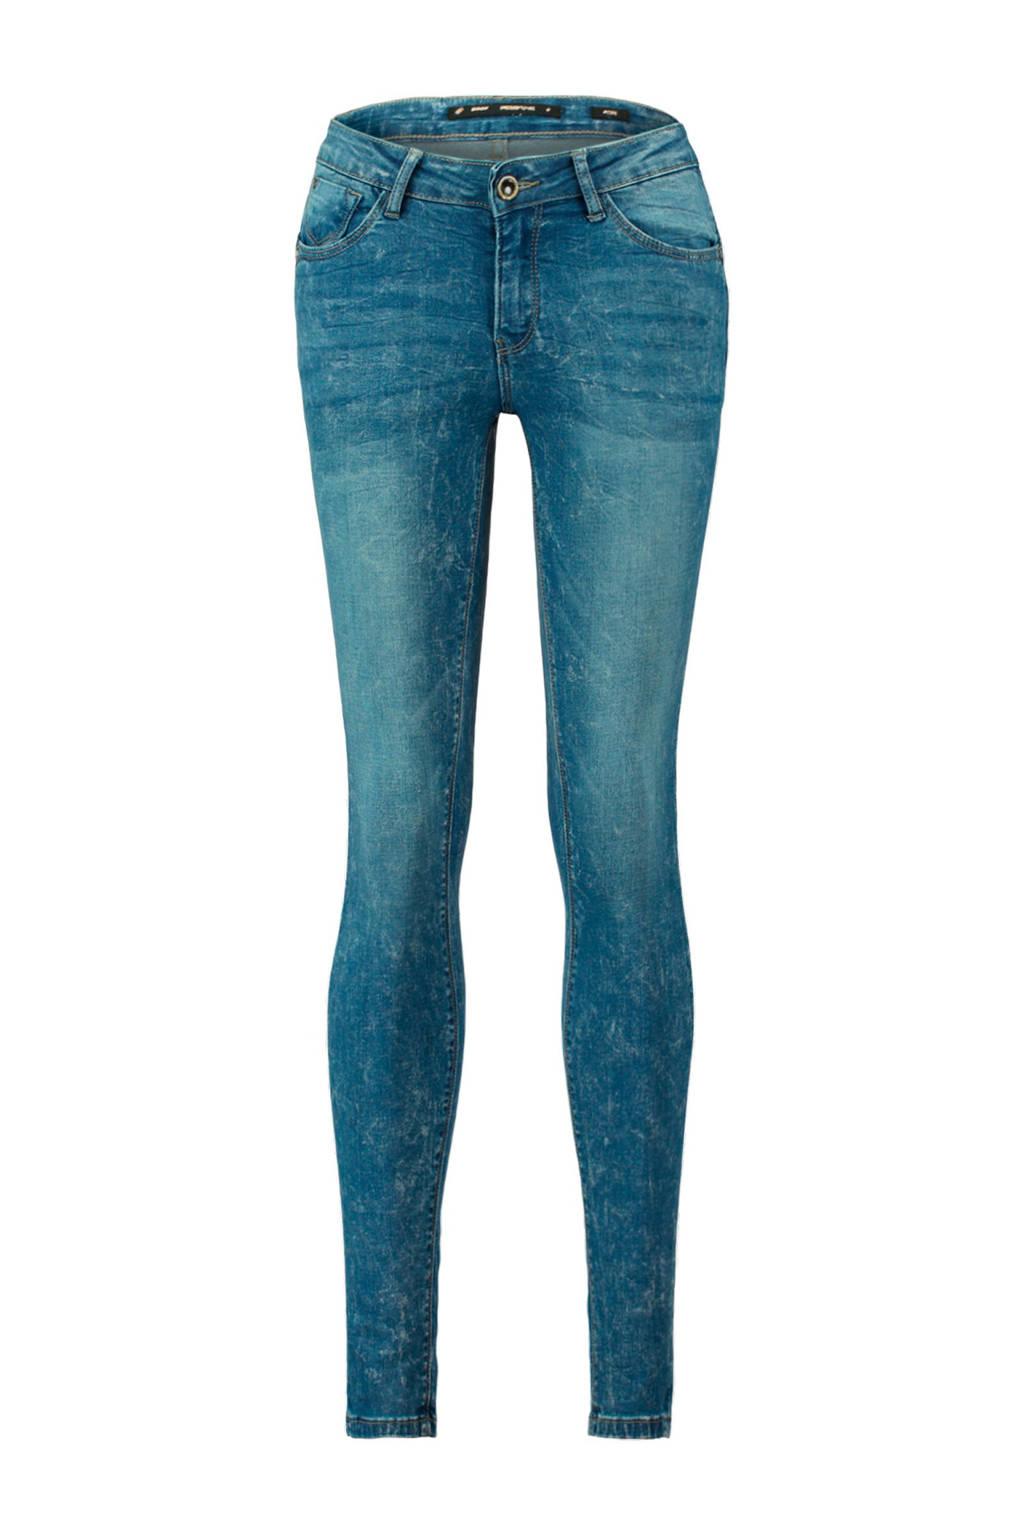 Coolcat Jeans Jeans Coolcat Jeans Skinny Jeans Coolcat Skinny Skinny Skinny Coolcat RdRqxr40n